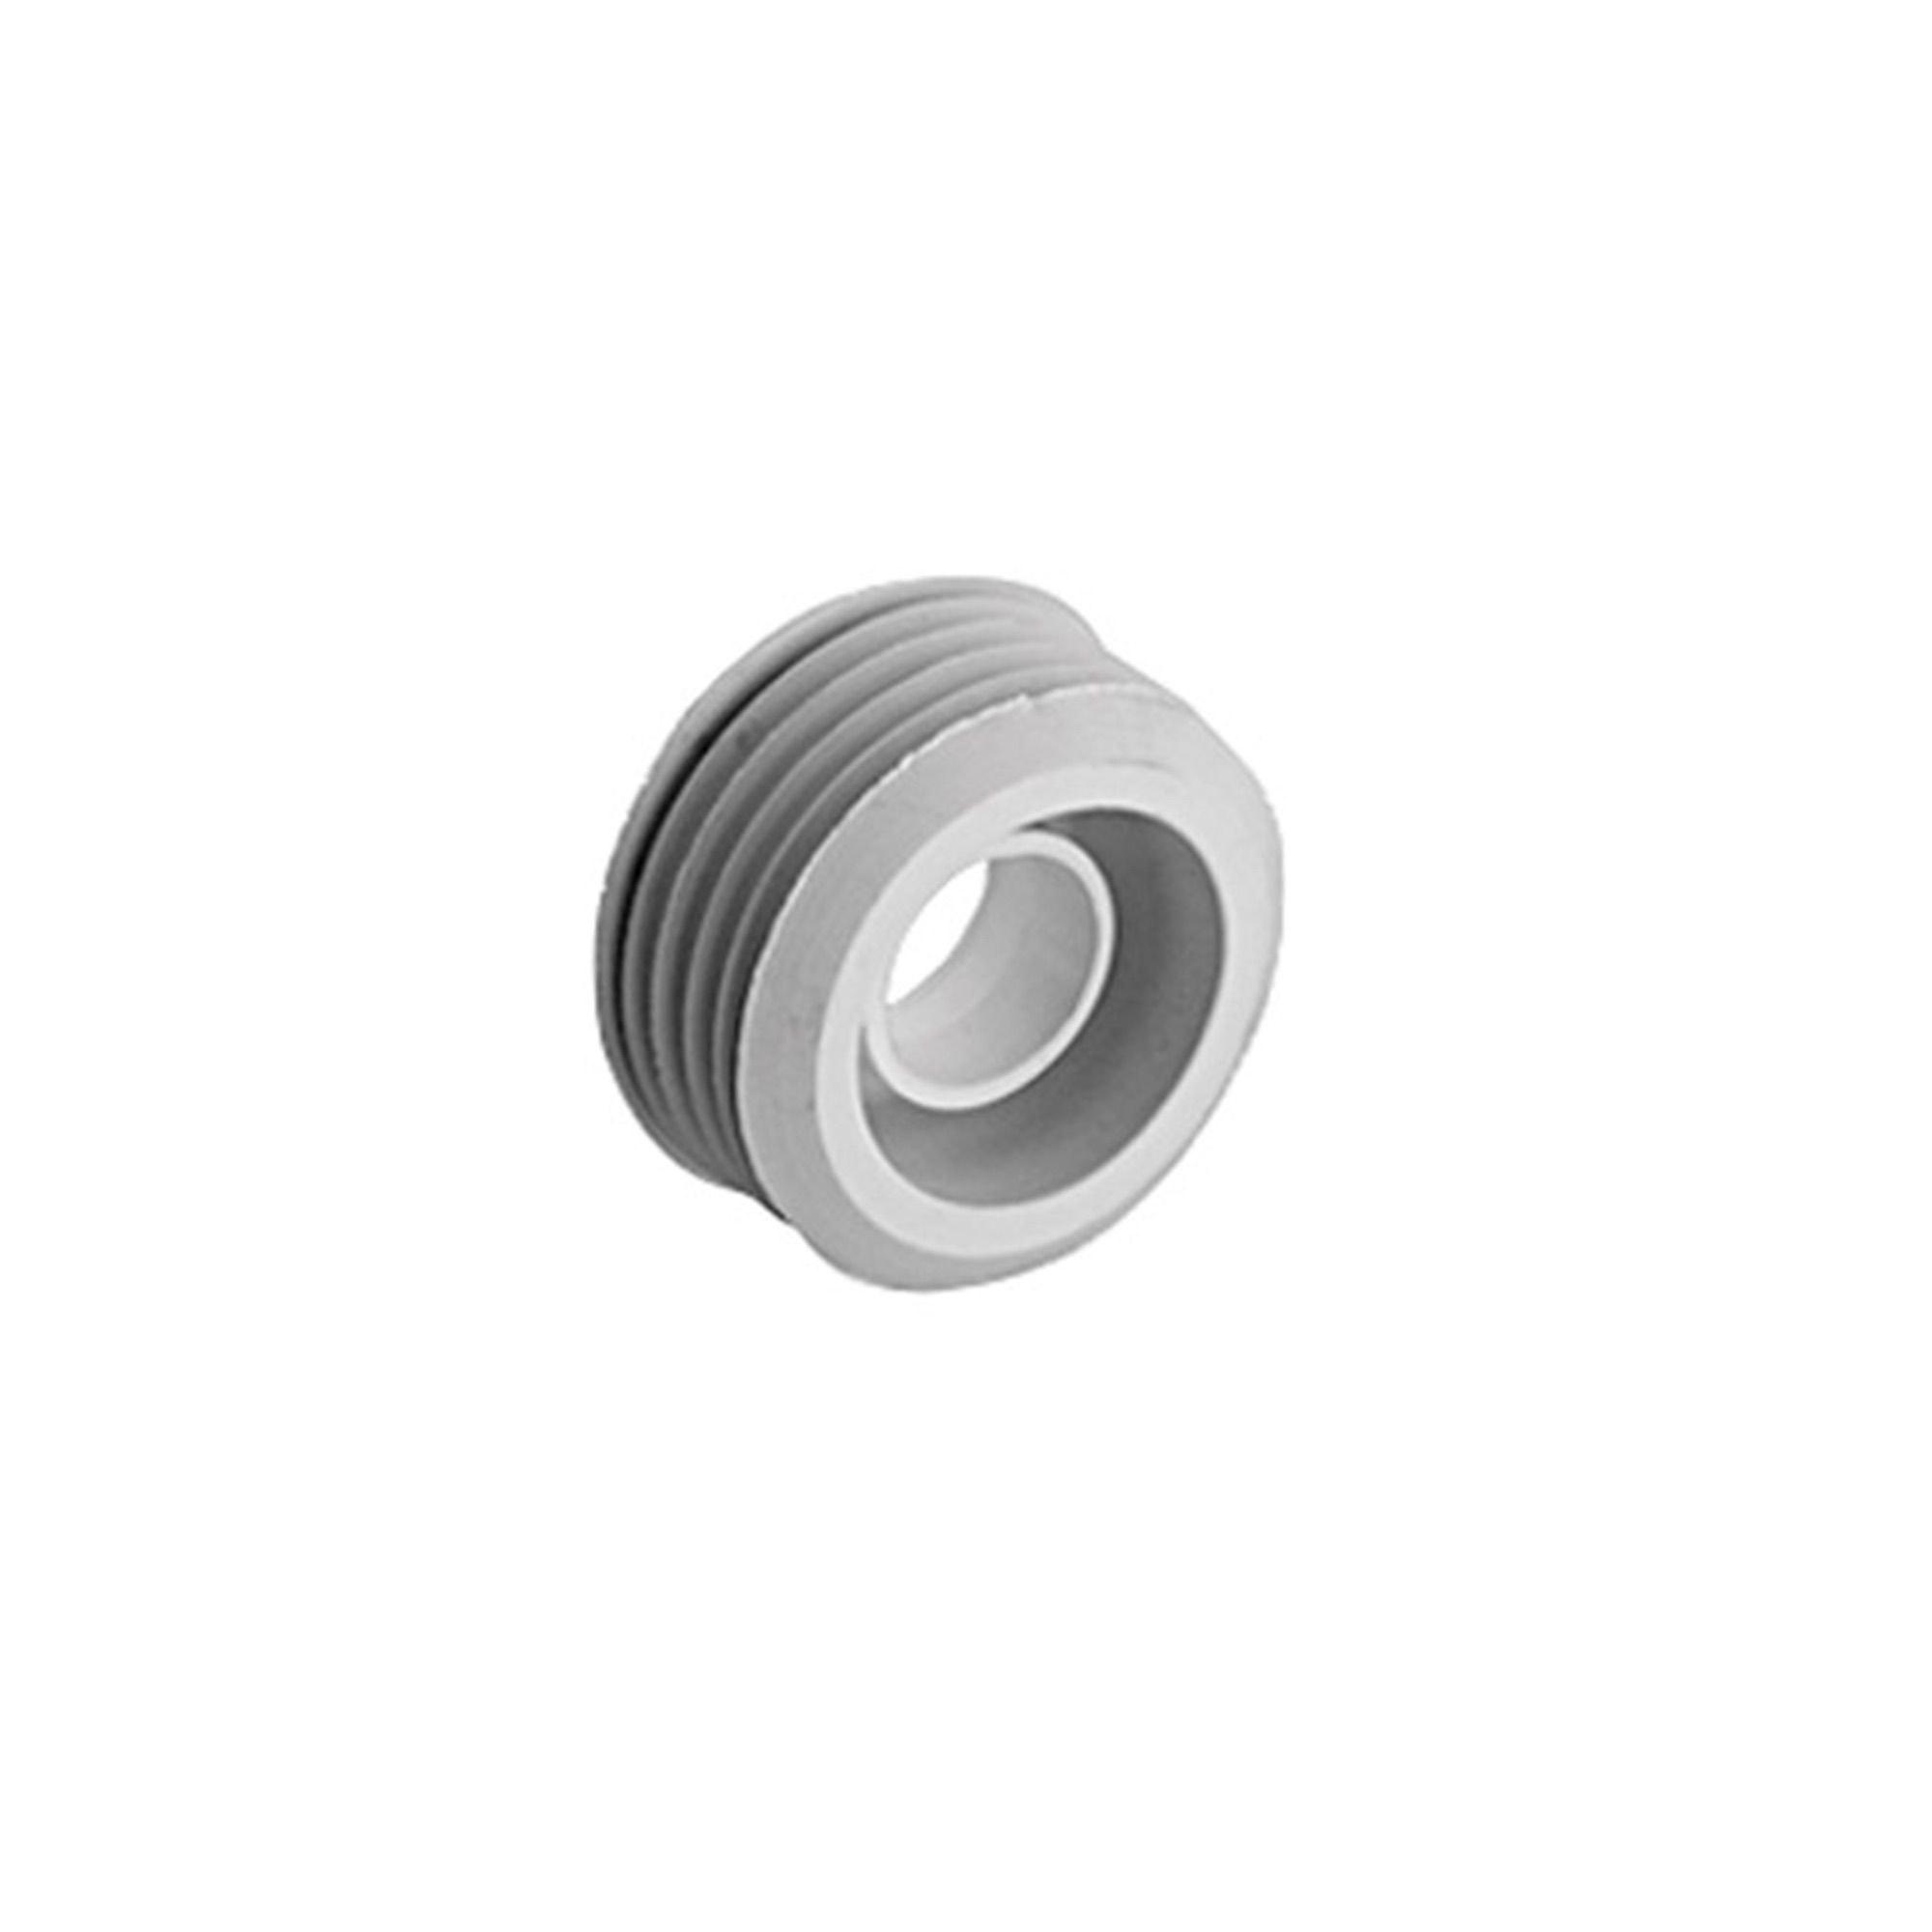 Garnitura conectare vas WC exterior D54 mm